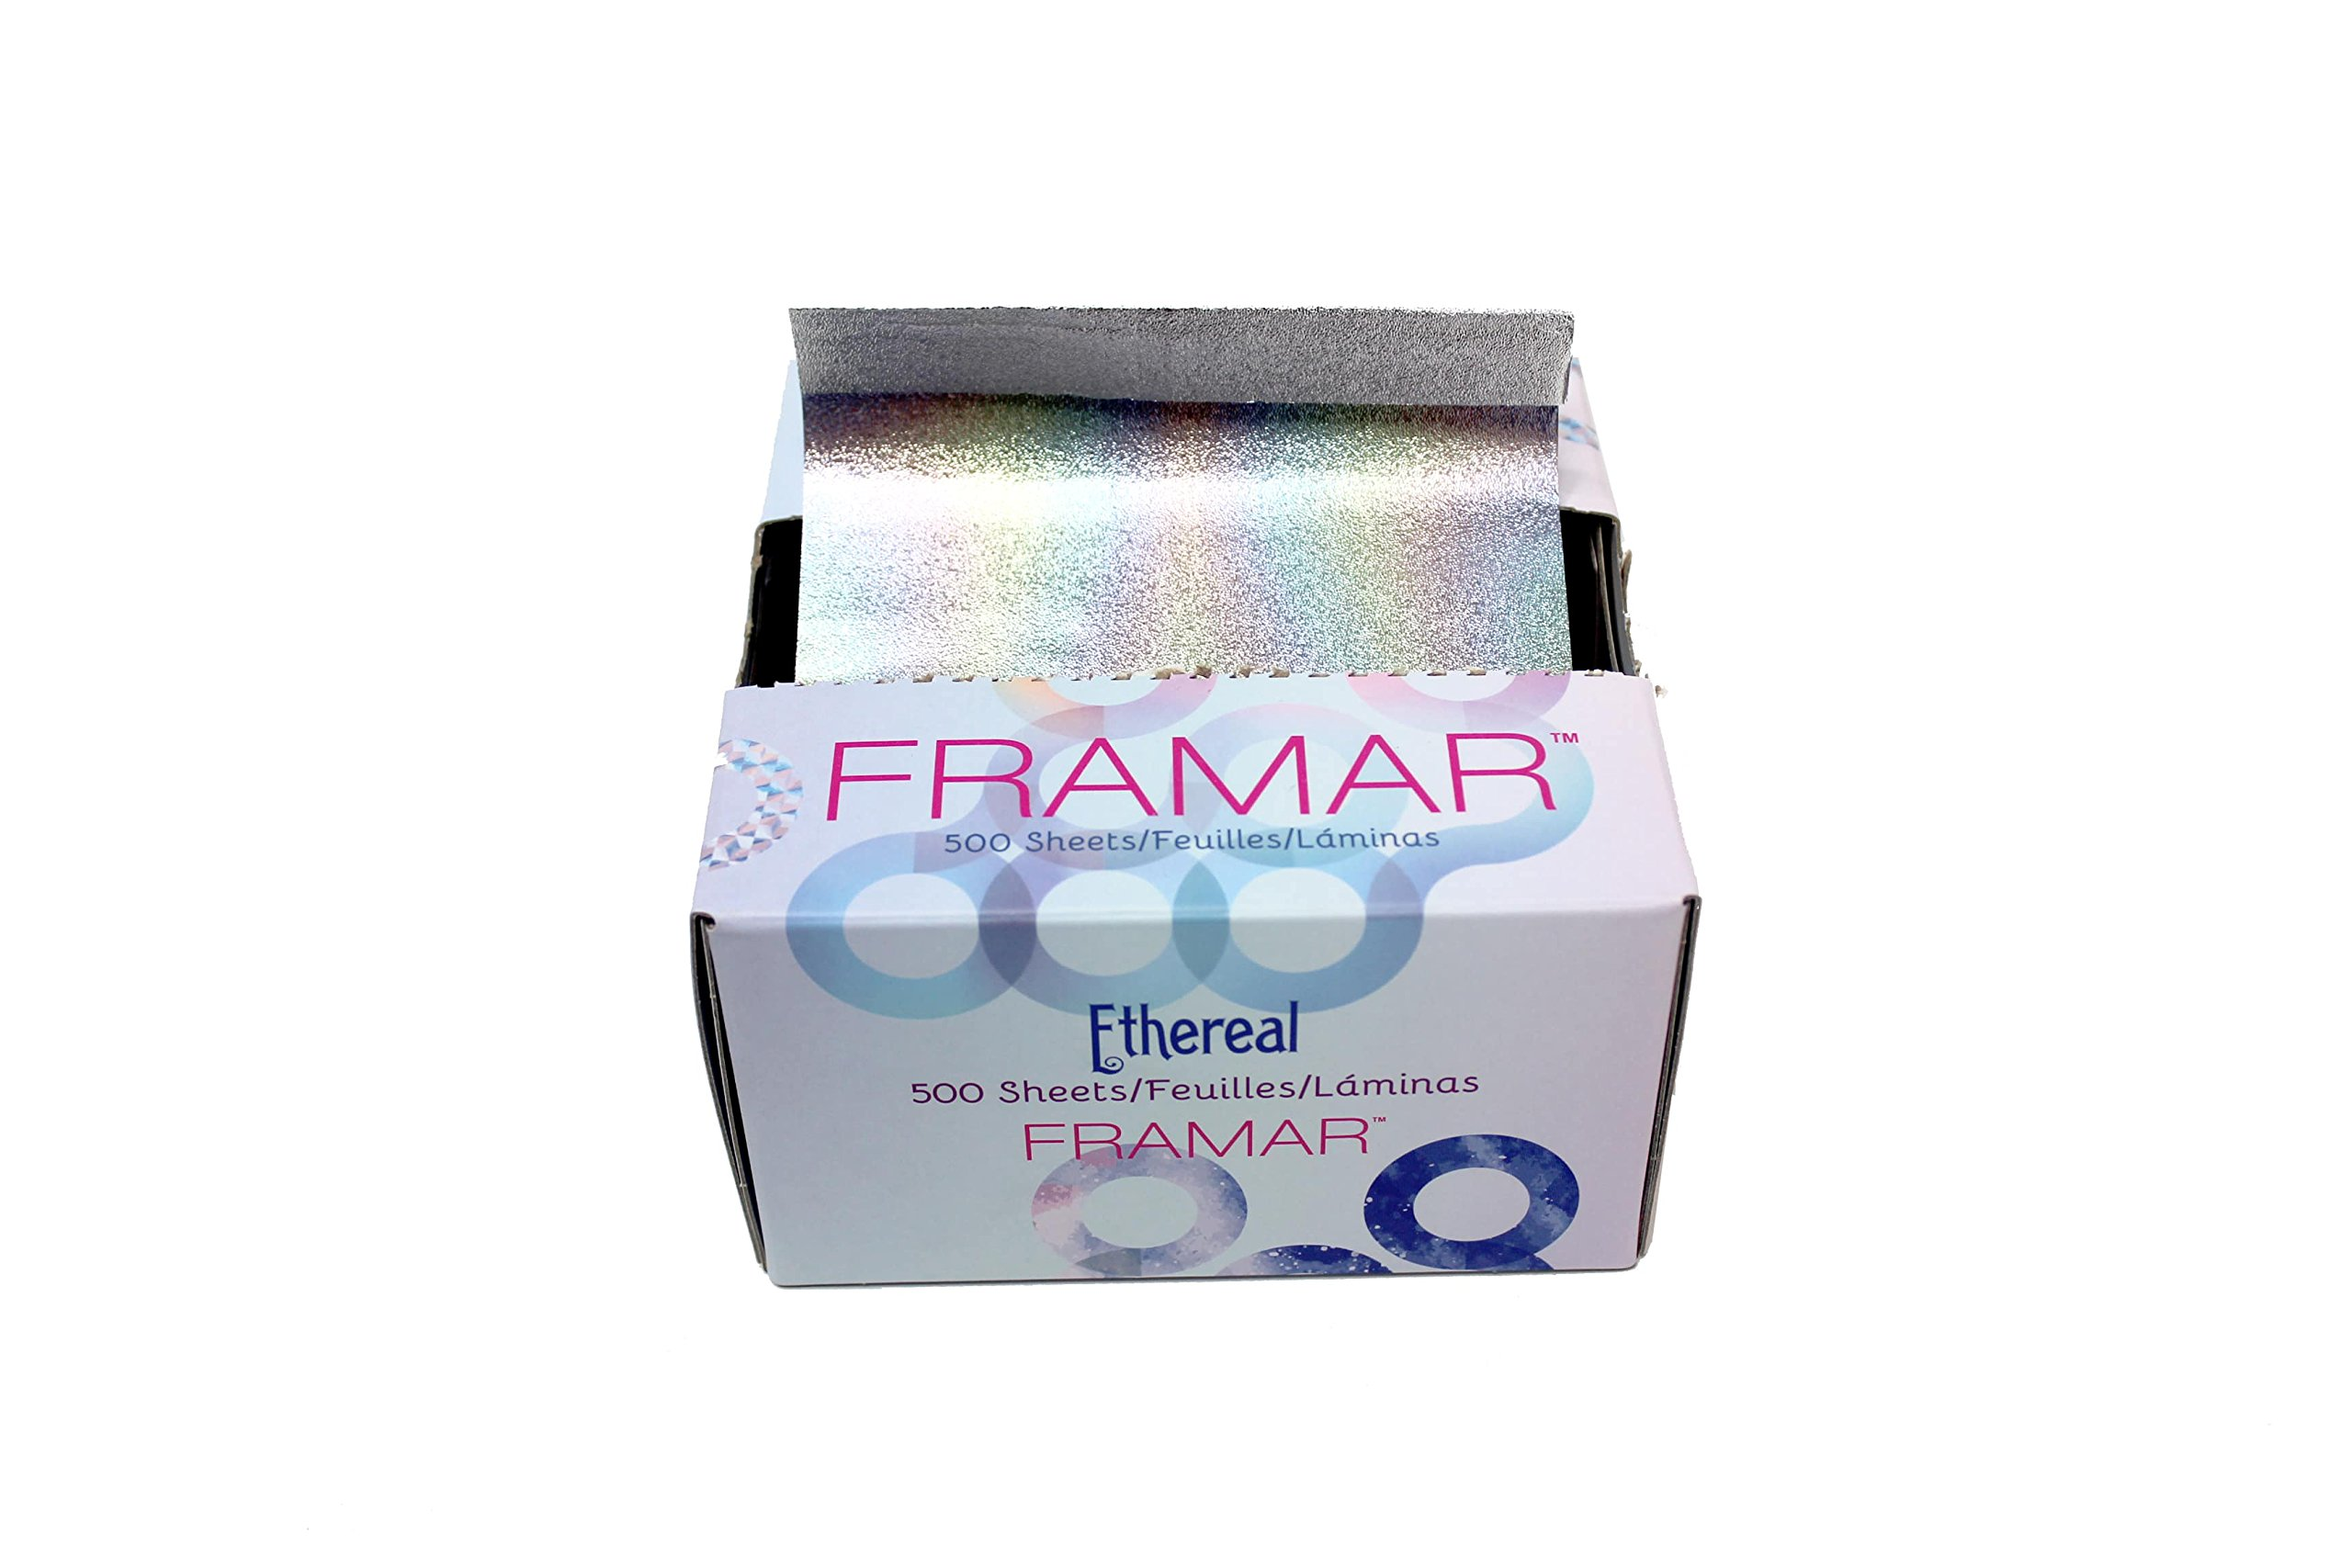 Framar Ethereal Pop Up Foil 5x11-500 Count by Framar (Image #2)